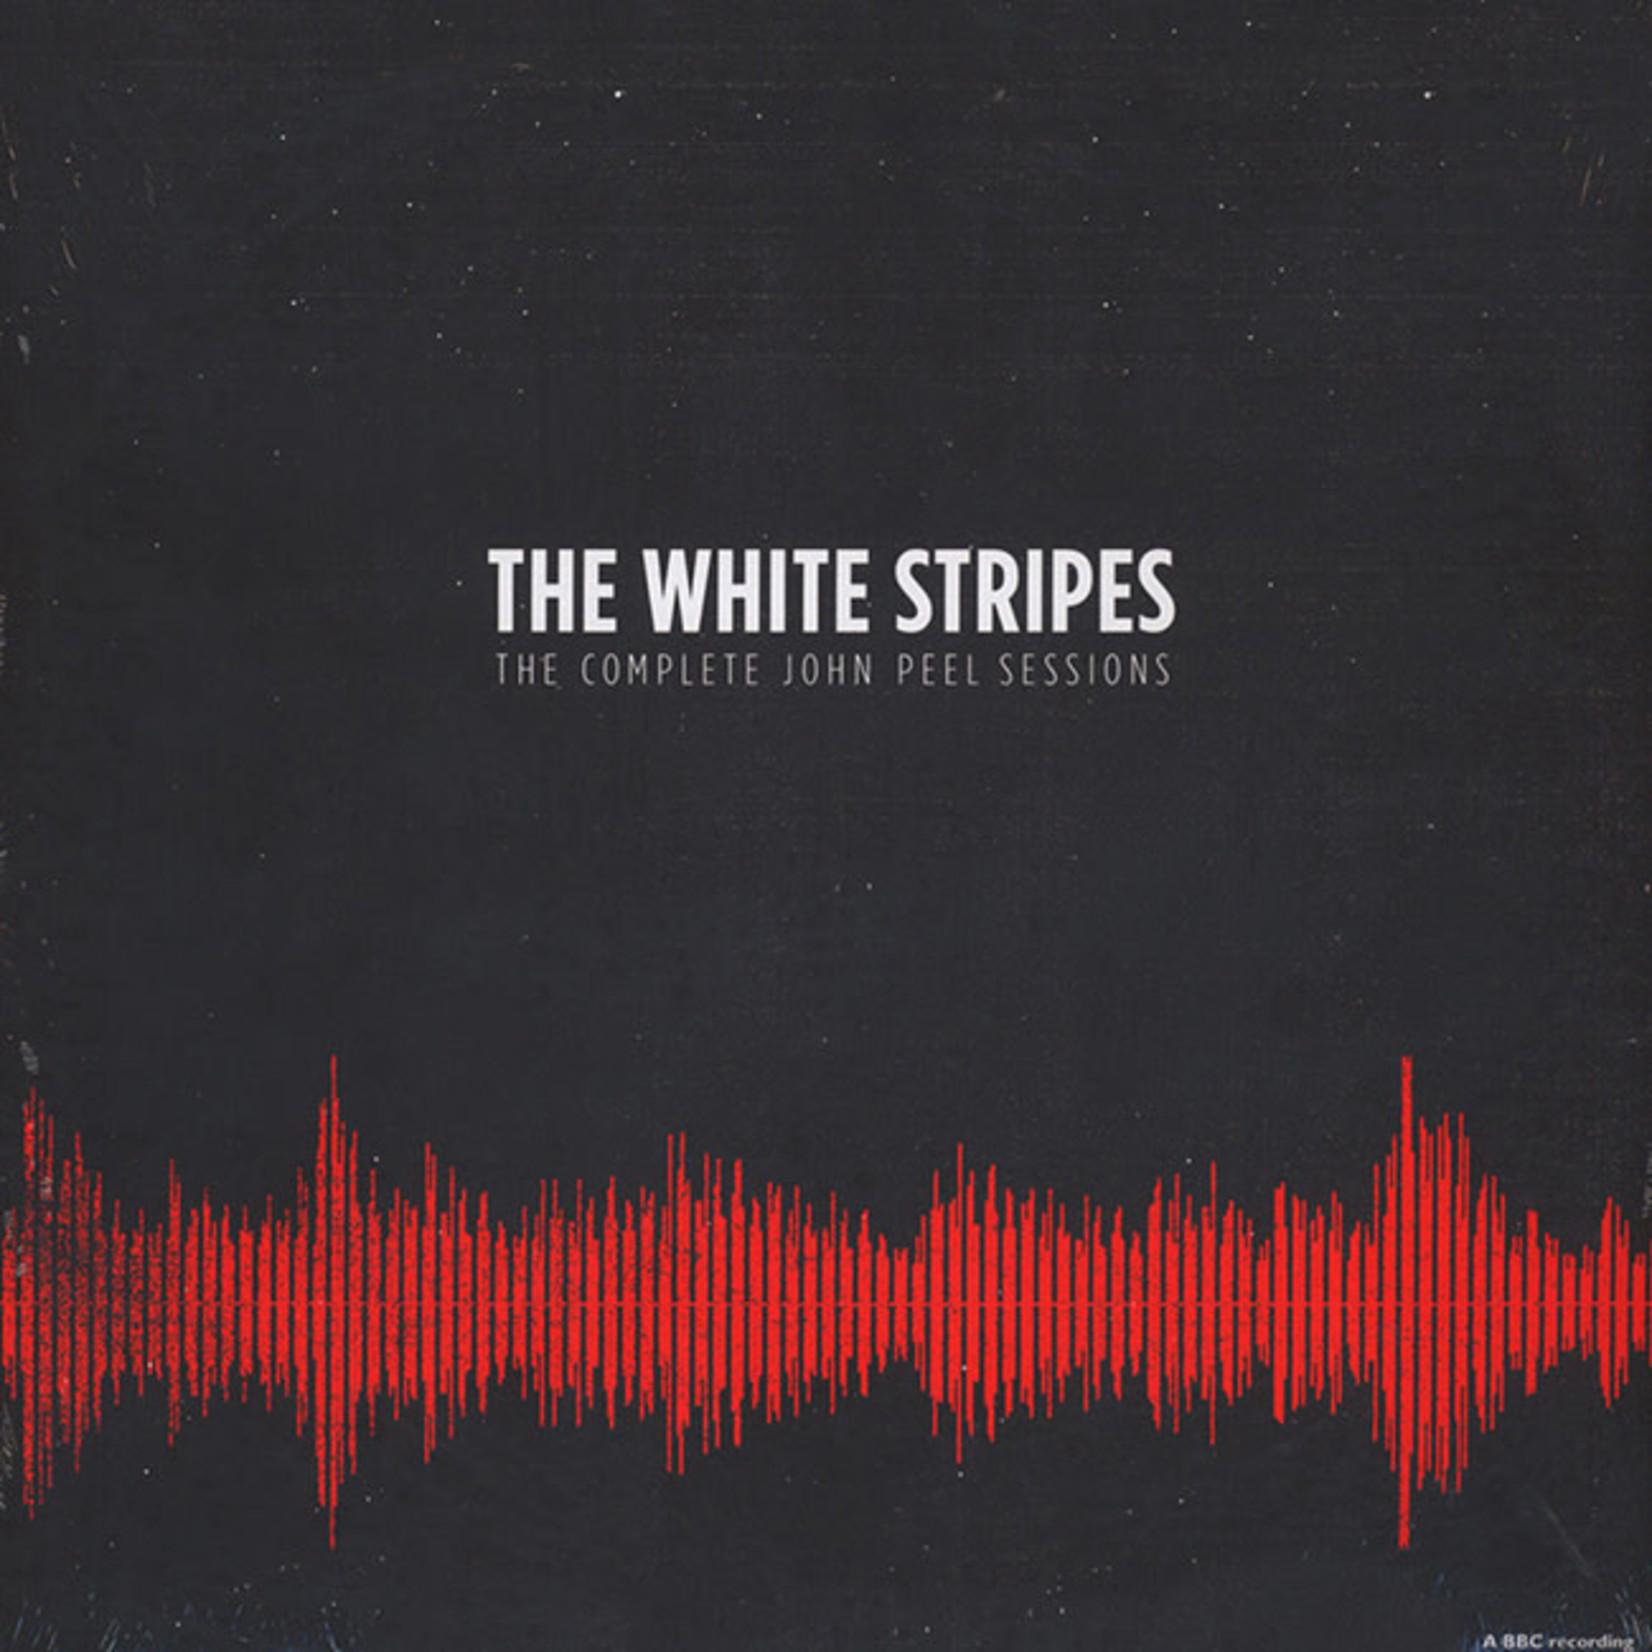 [New] White Stripes: The Complete John Peel Sessions (2LP, colour vinyl)